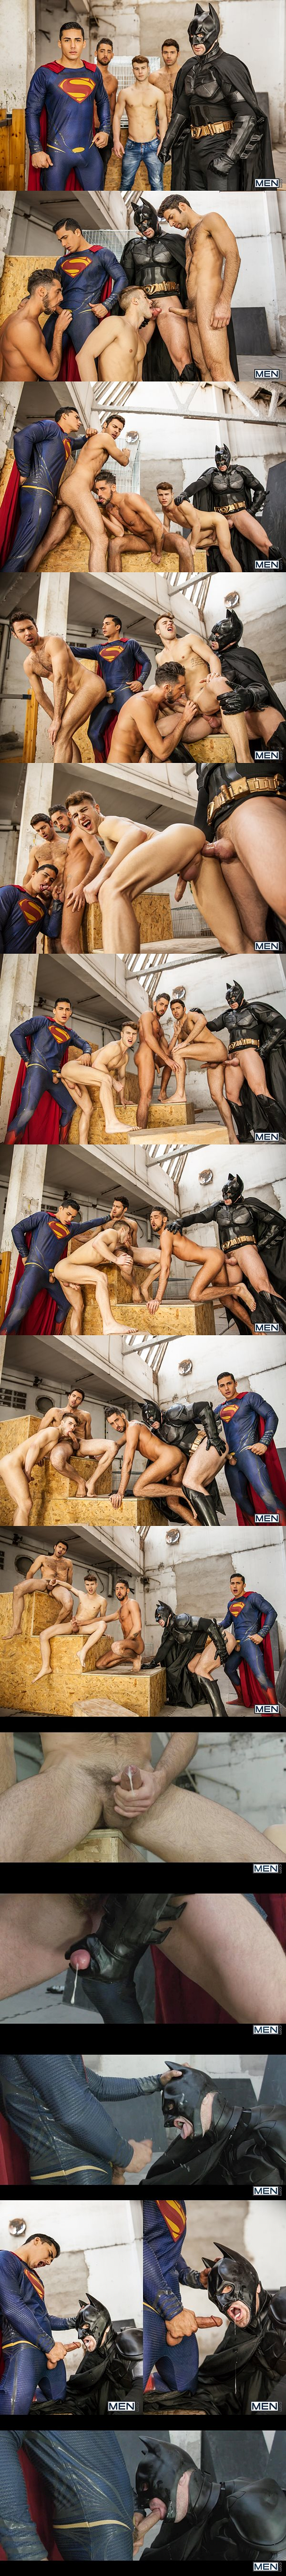 Topher DiMaggio Fucks Allen King, Dario Beck, Massimo Piano and Trenton Ducati in Batman V Superman A Gay XXX Parody Part 3 at Jizzorgy 02